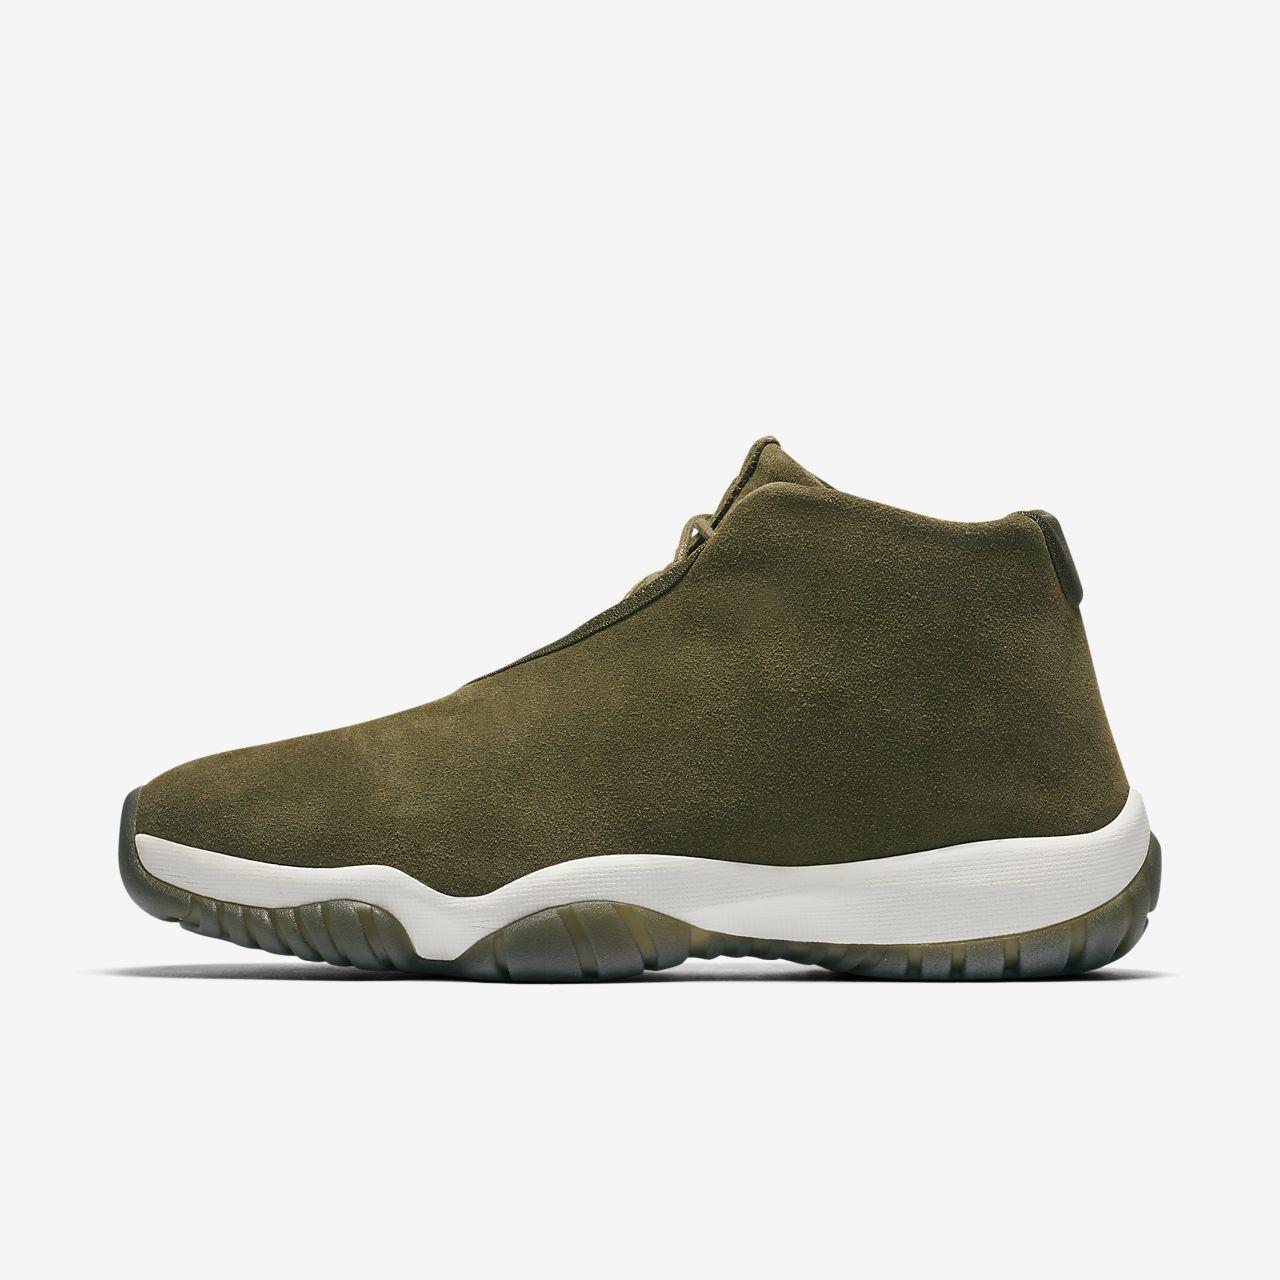 Chaussure Air Jordan Future pour Femme